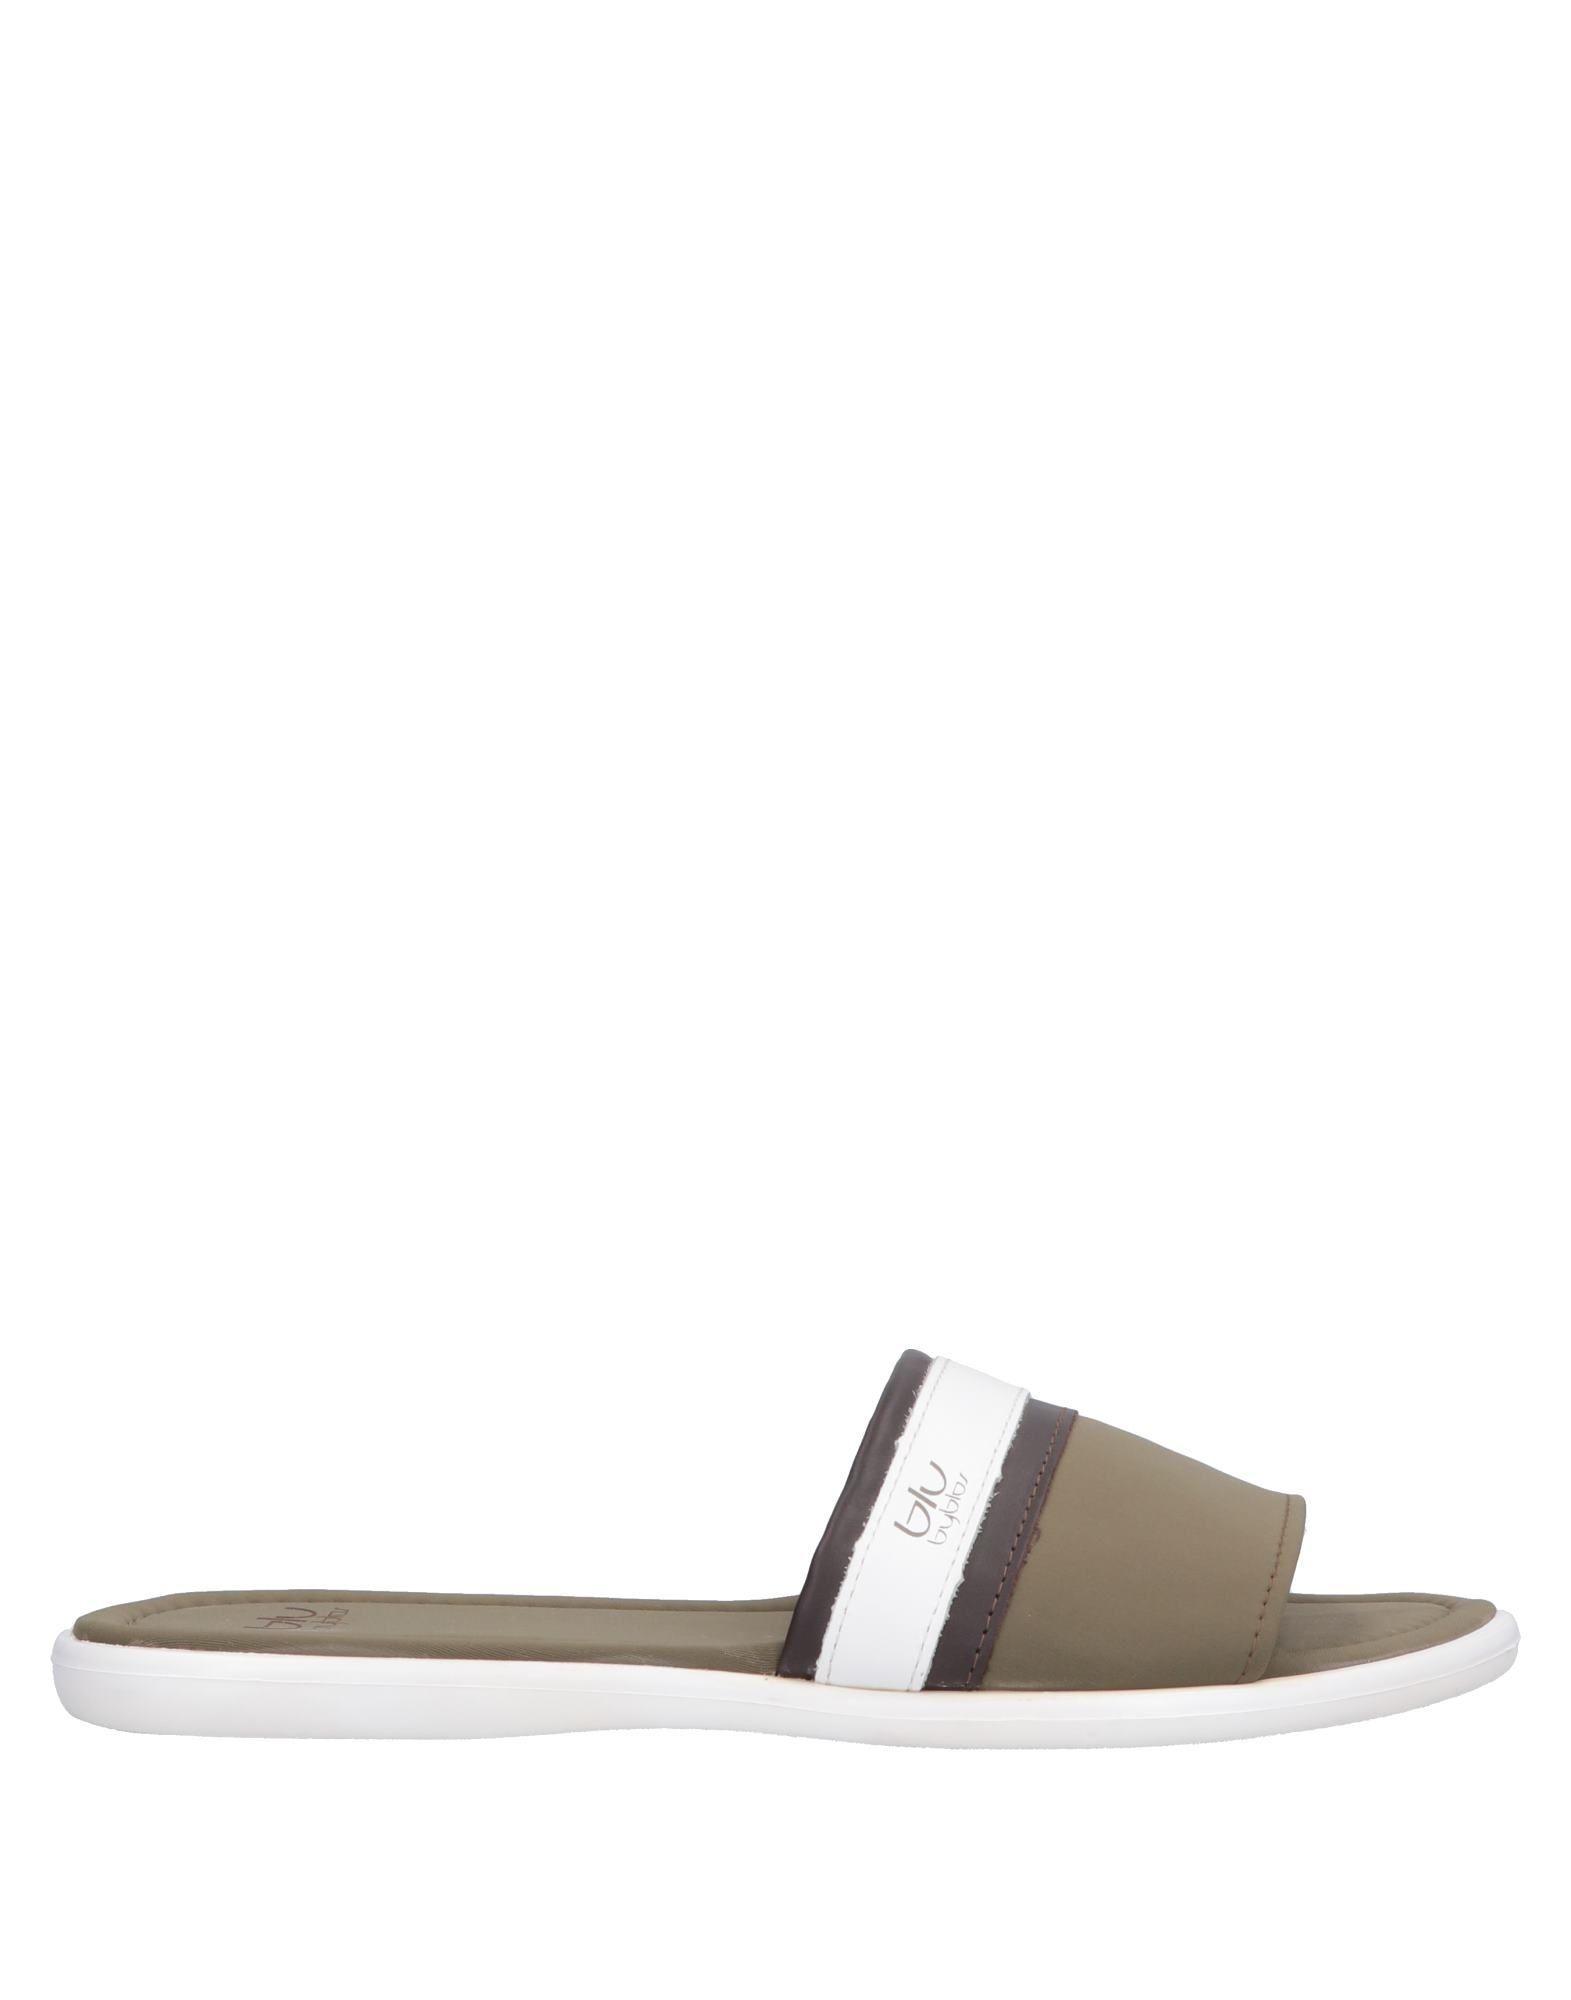 adaa4c808 Blu Byblos Sandals - Men Blu Byblos Sandals online on YOOX United States -  11612684FA